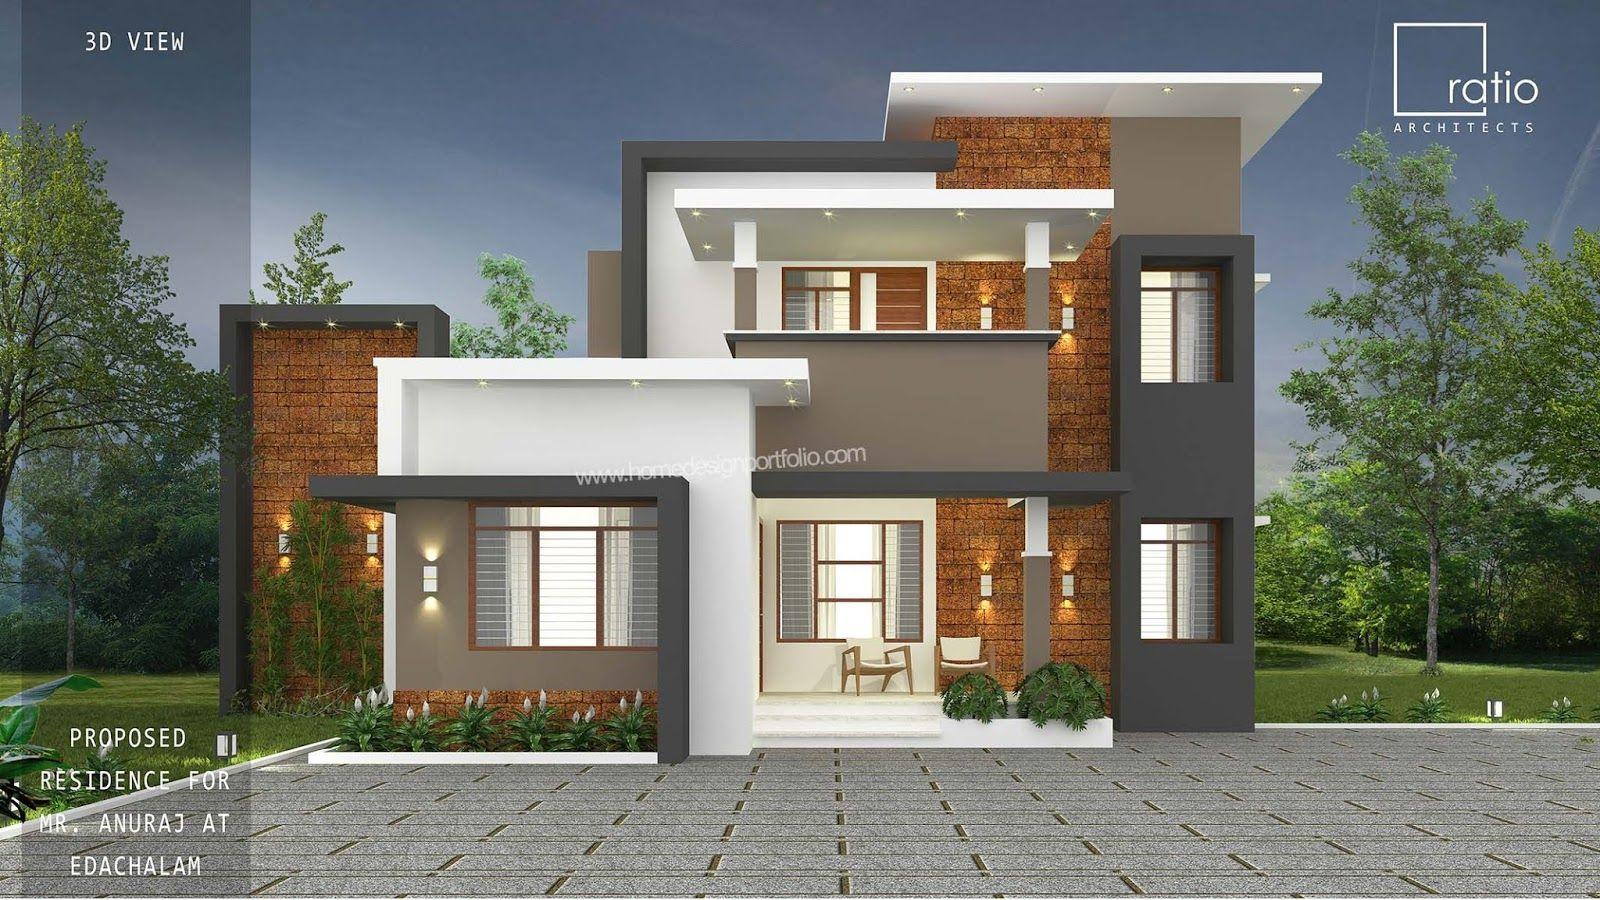 30 Lakh 1770 Sq Ft 4 Bedroom Malappuram Home Design Idea Kerala House Design 2 Storey House Design Small House Front Design